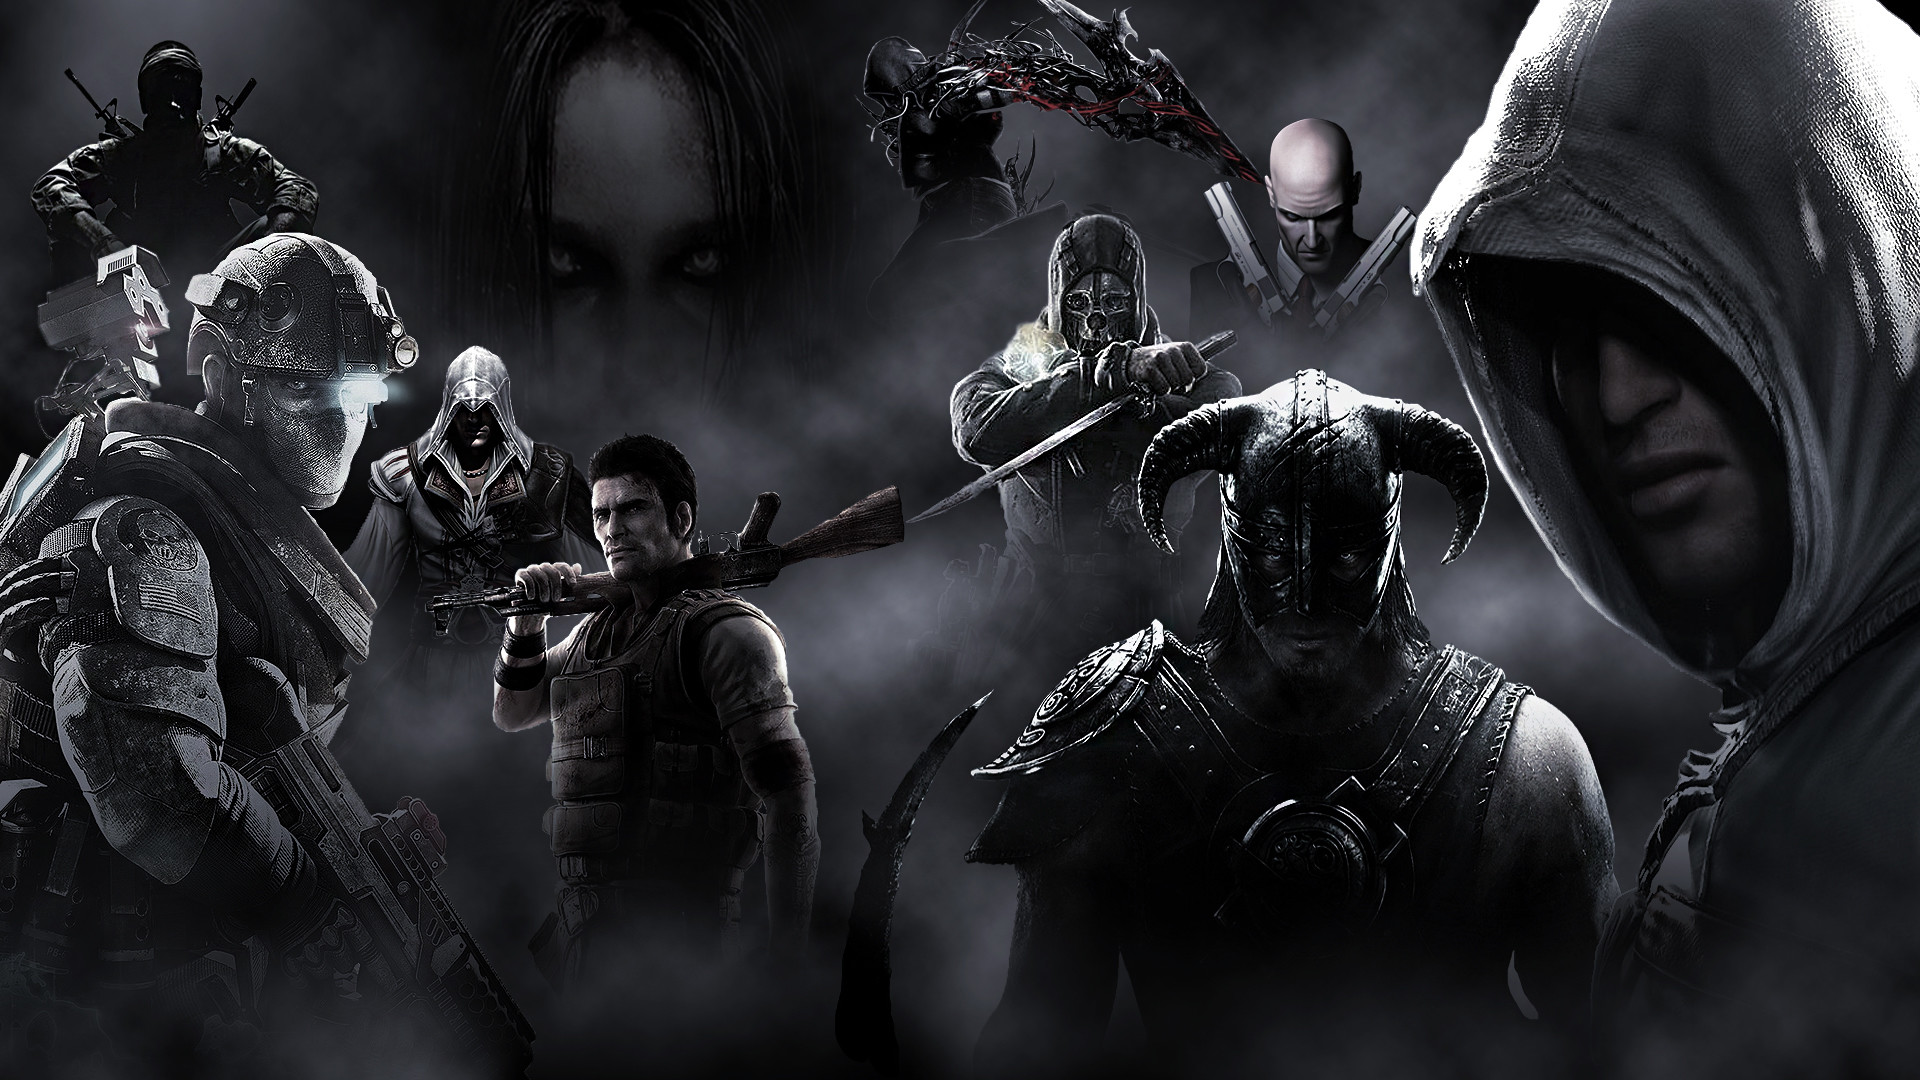 Video Game – Collage Altair Skyrim Farcry Ezio Wallpaper